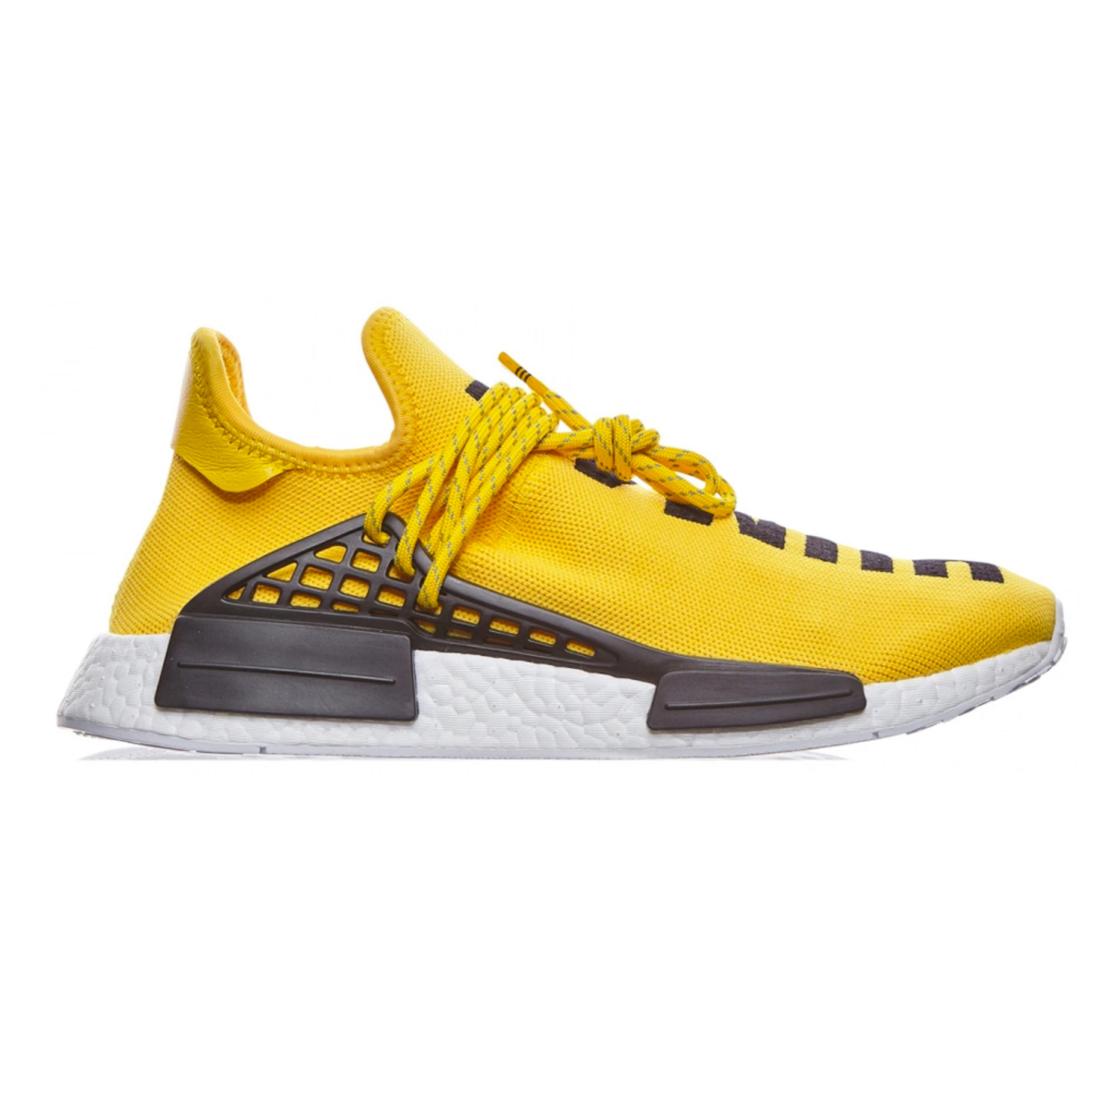 adidas yellow shoe